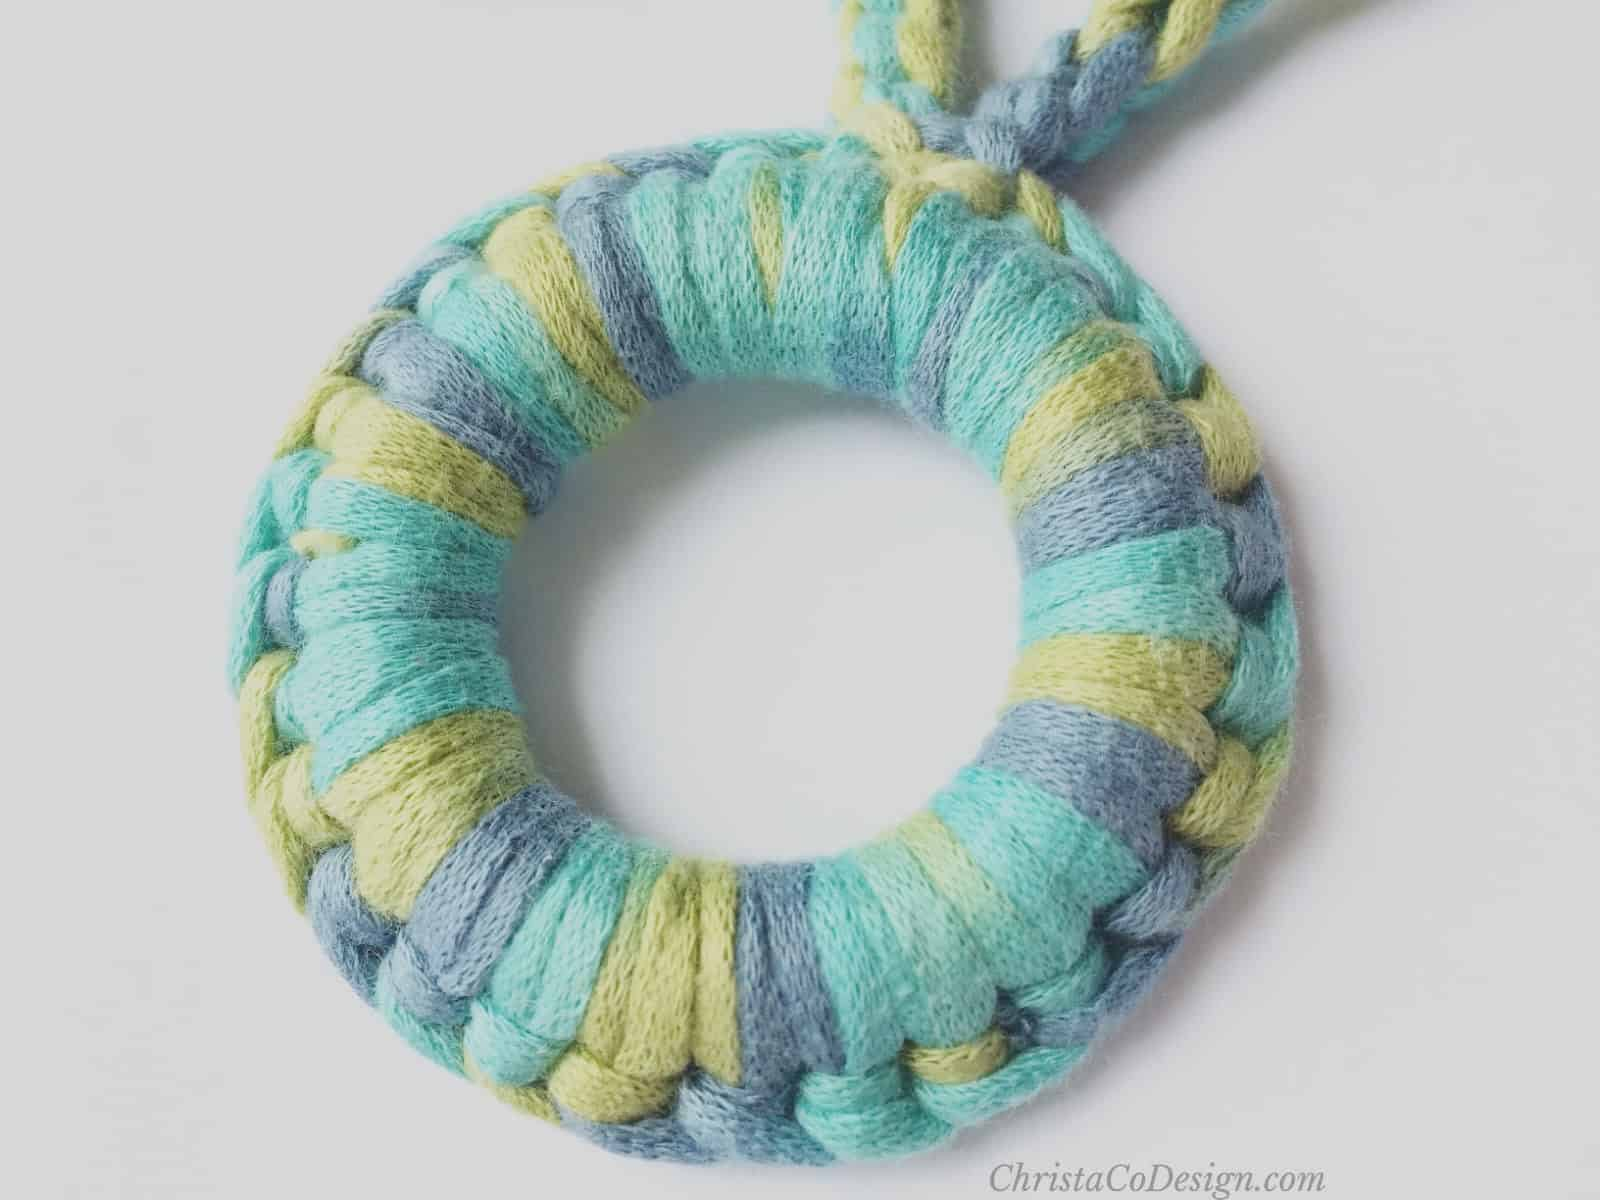 picture of crochet stitch around ring